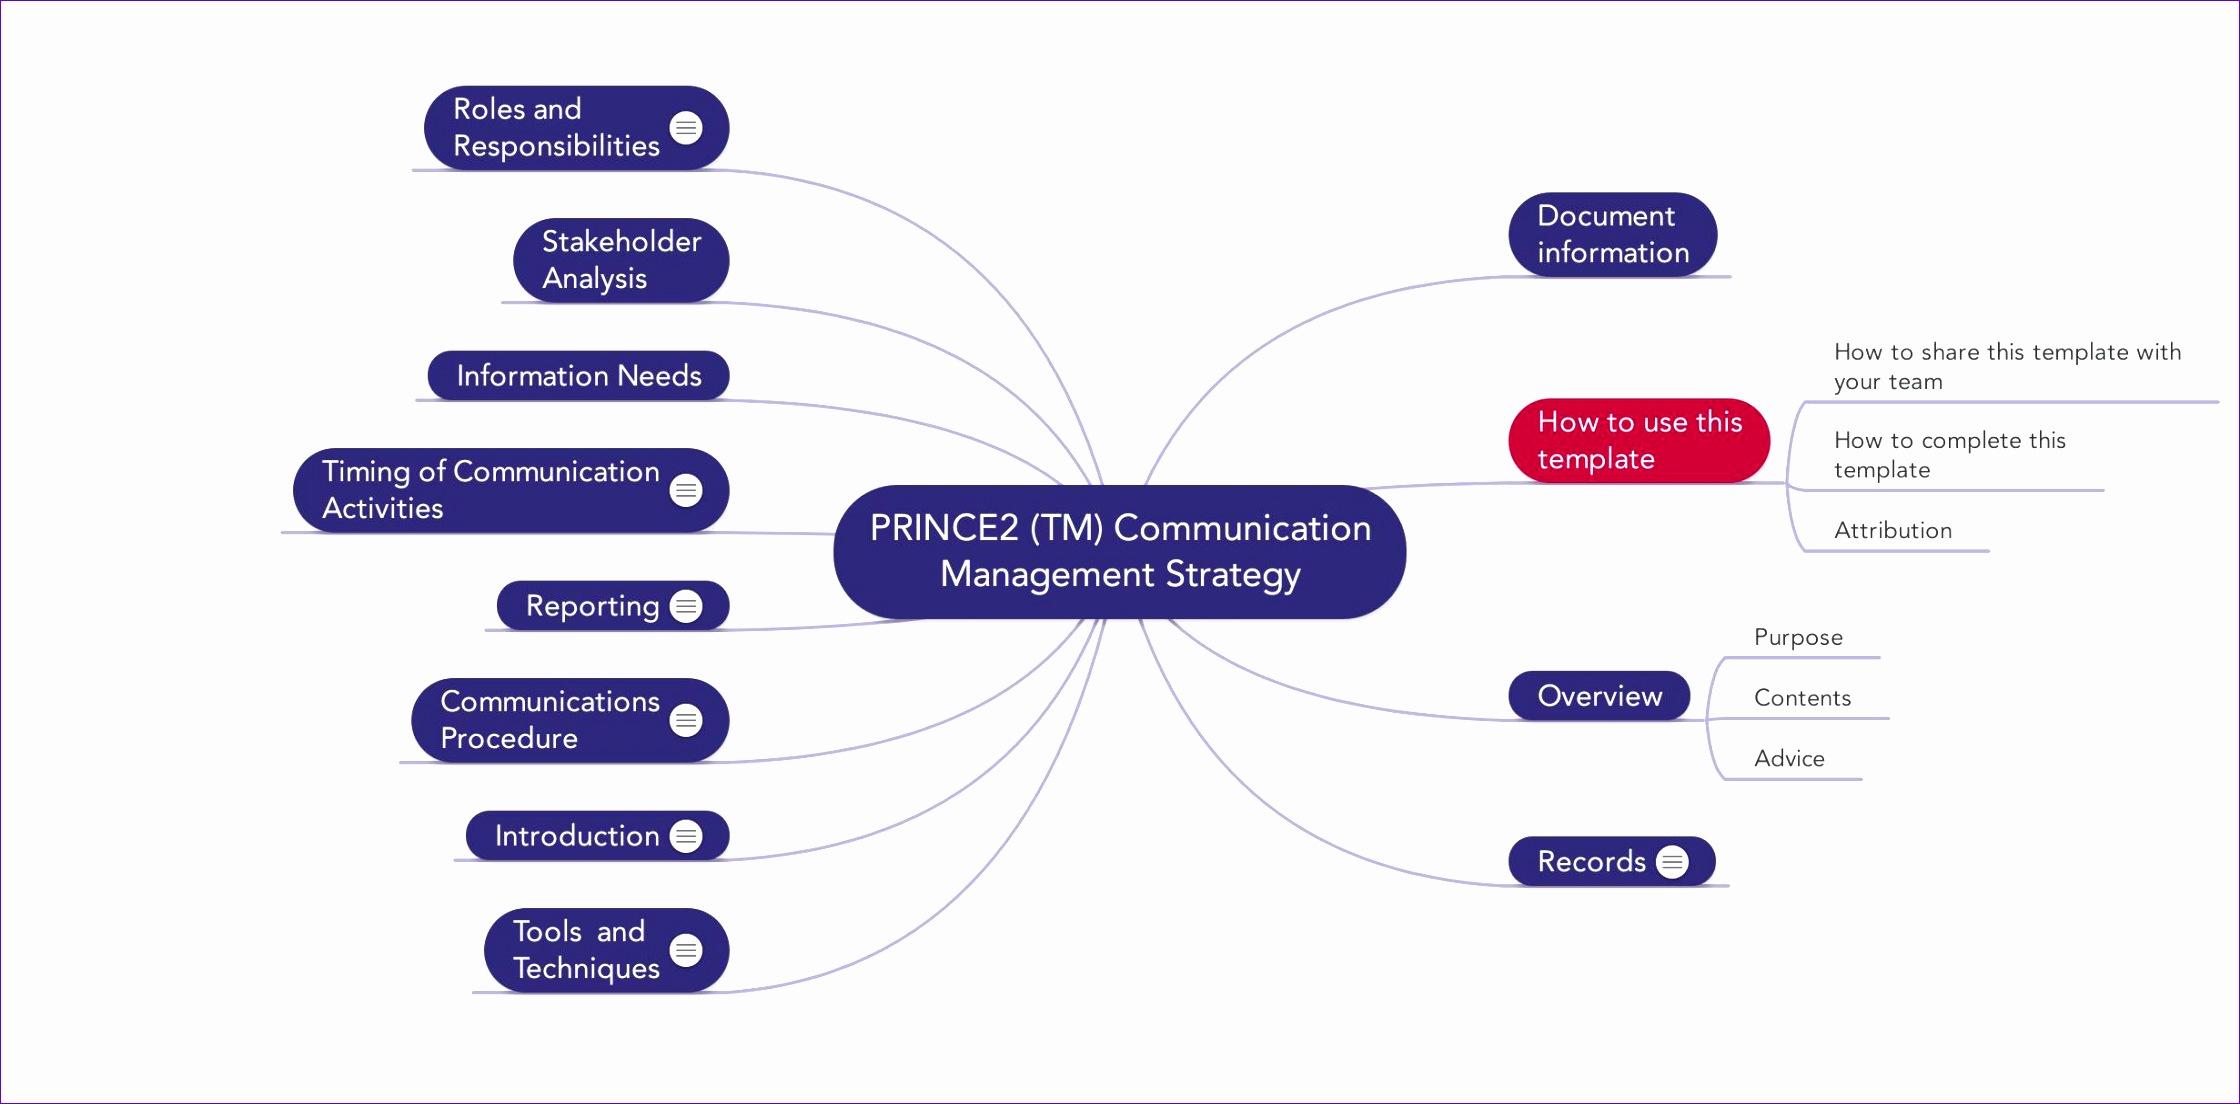 PRINCE2 TM munication Management Strategy